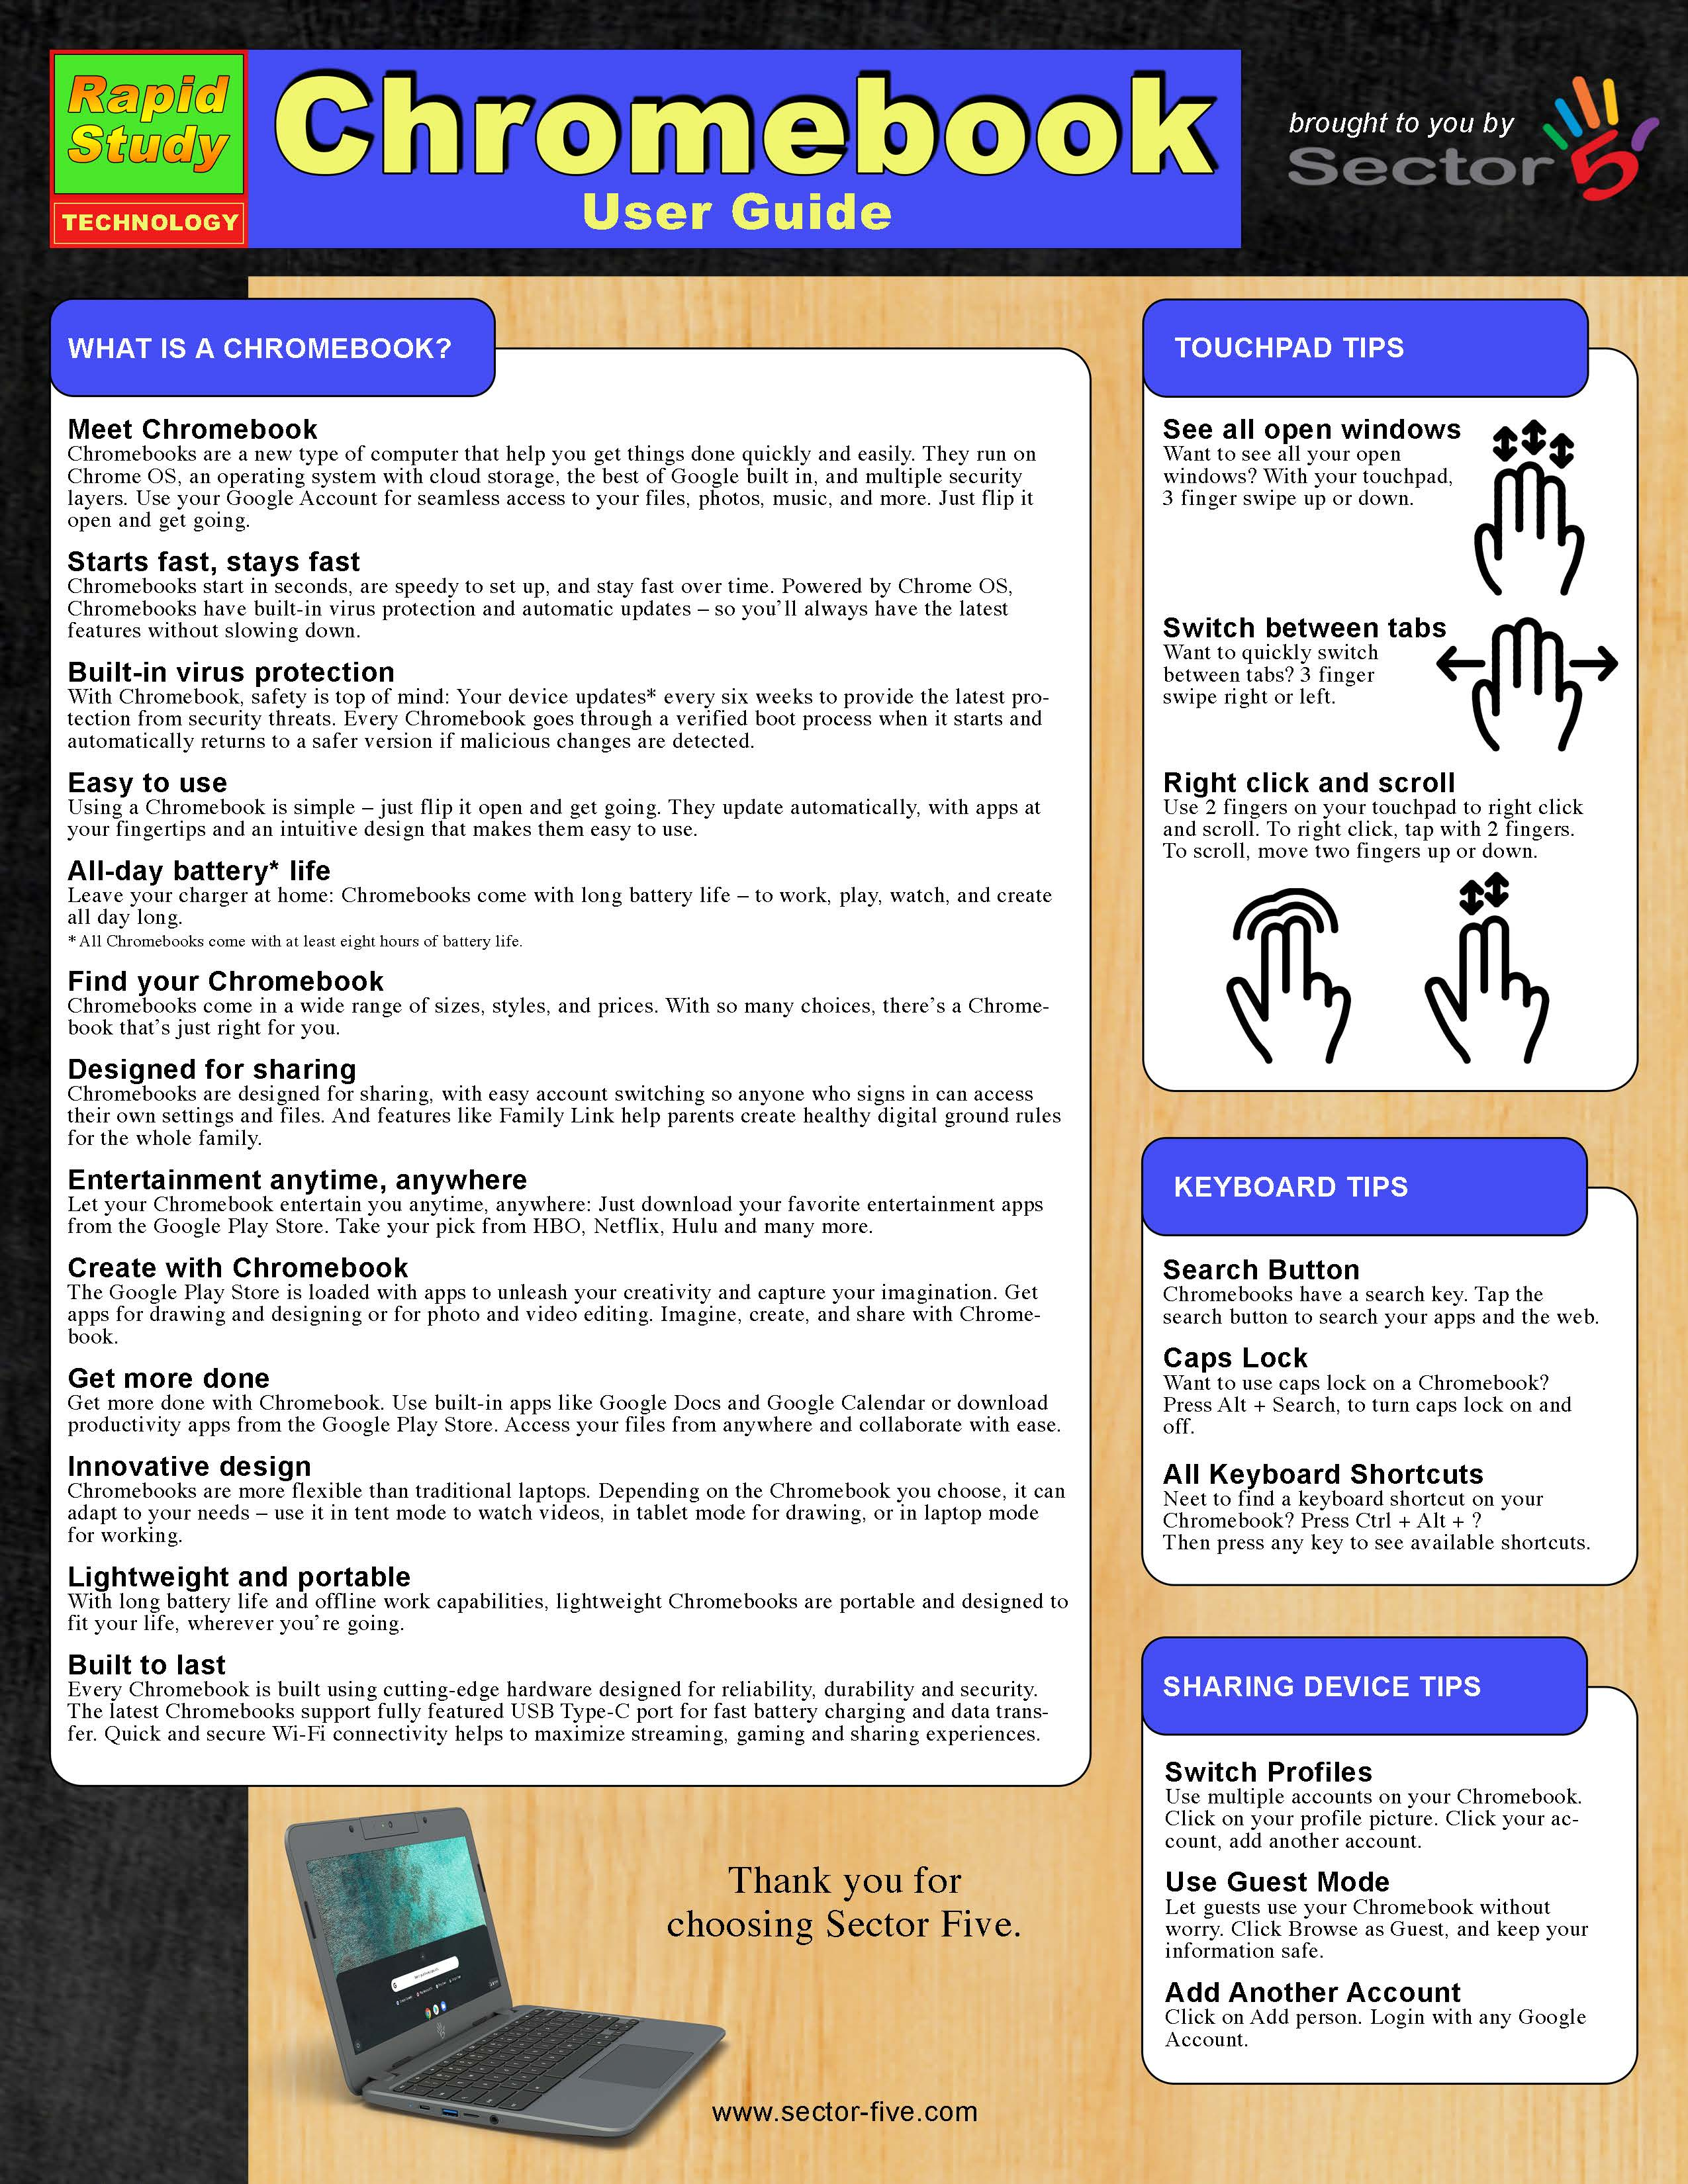 Sector 5 Chromebook User Guide